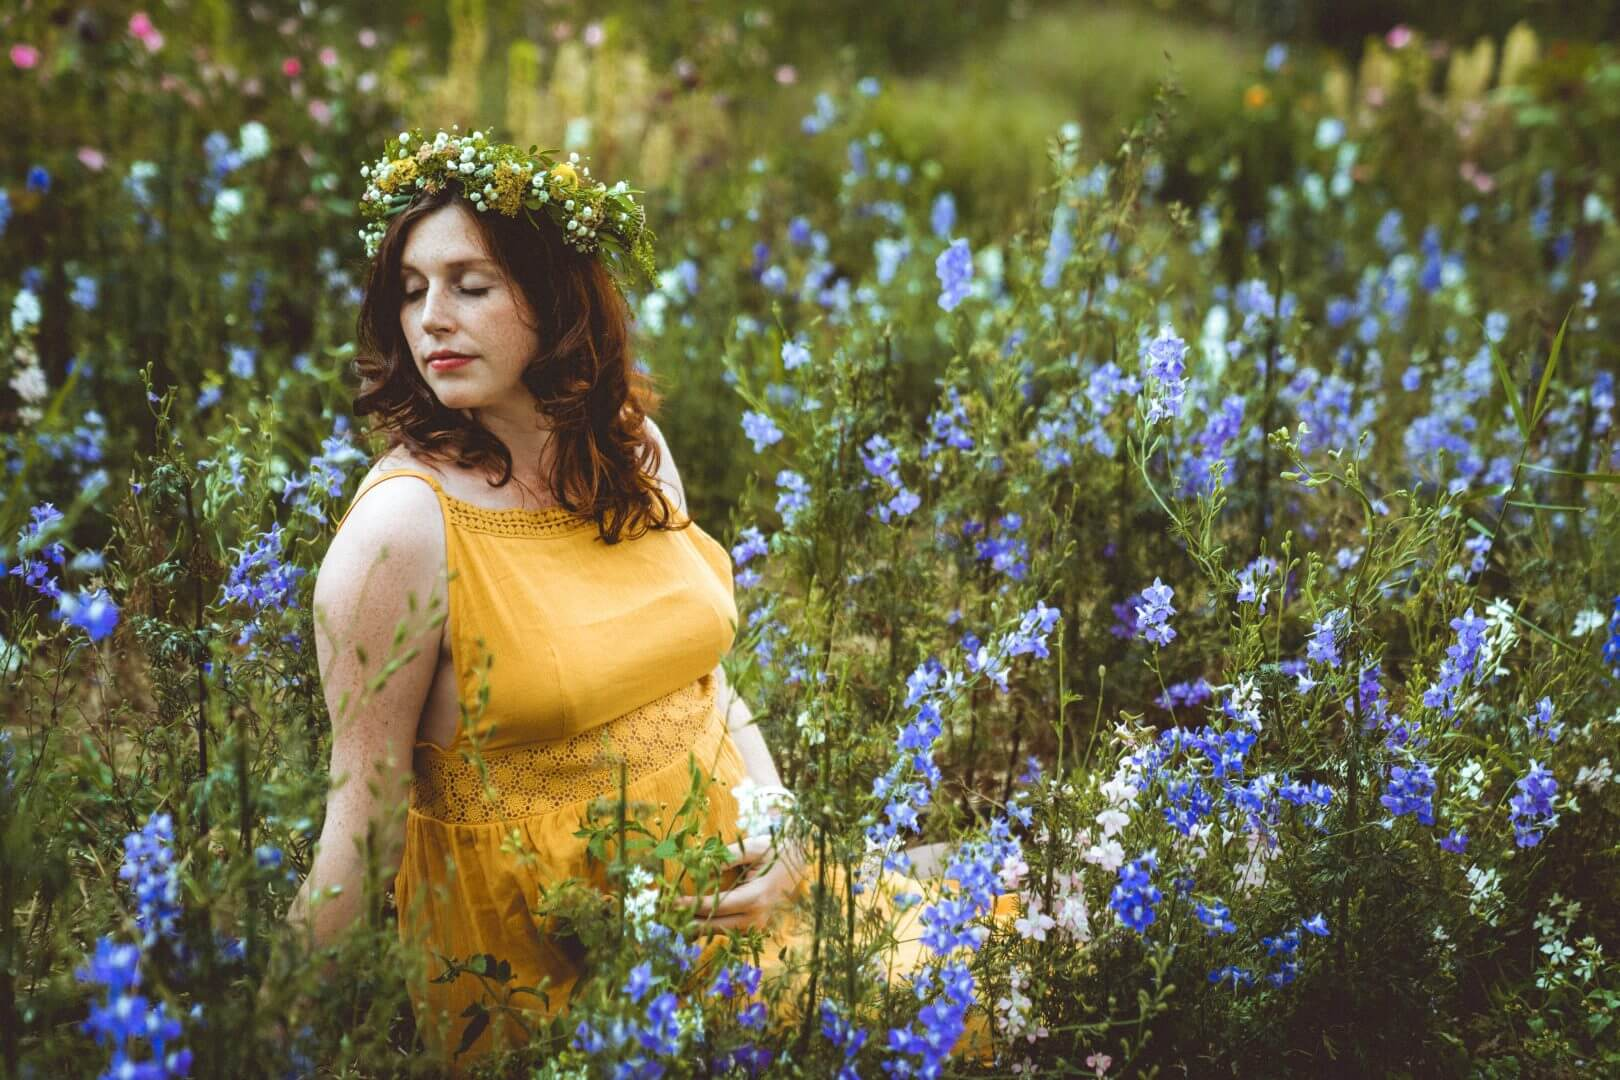 Schwangere Frau sitzt in gelbem Kleid in blauem Blumenfeld